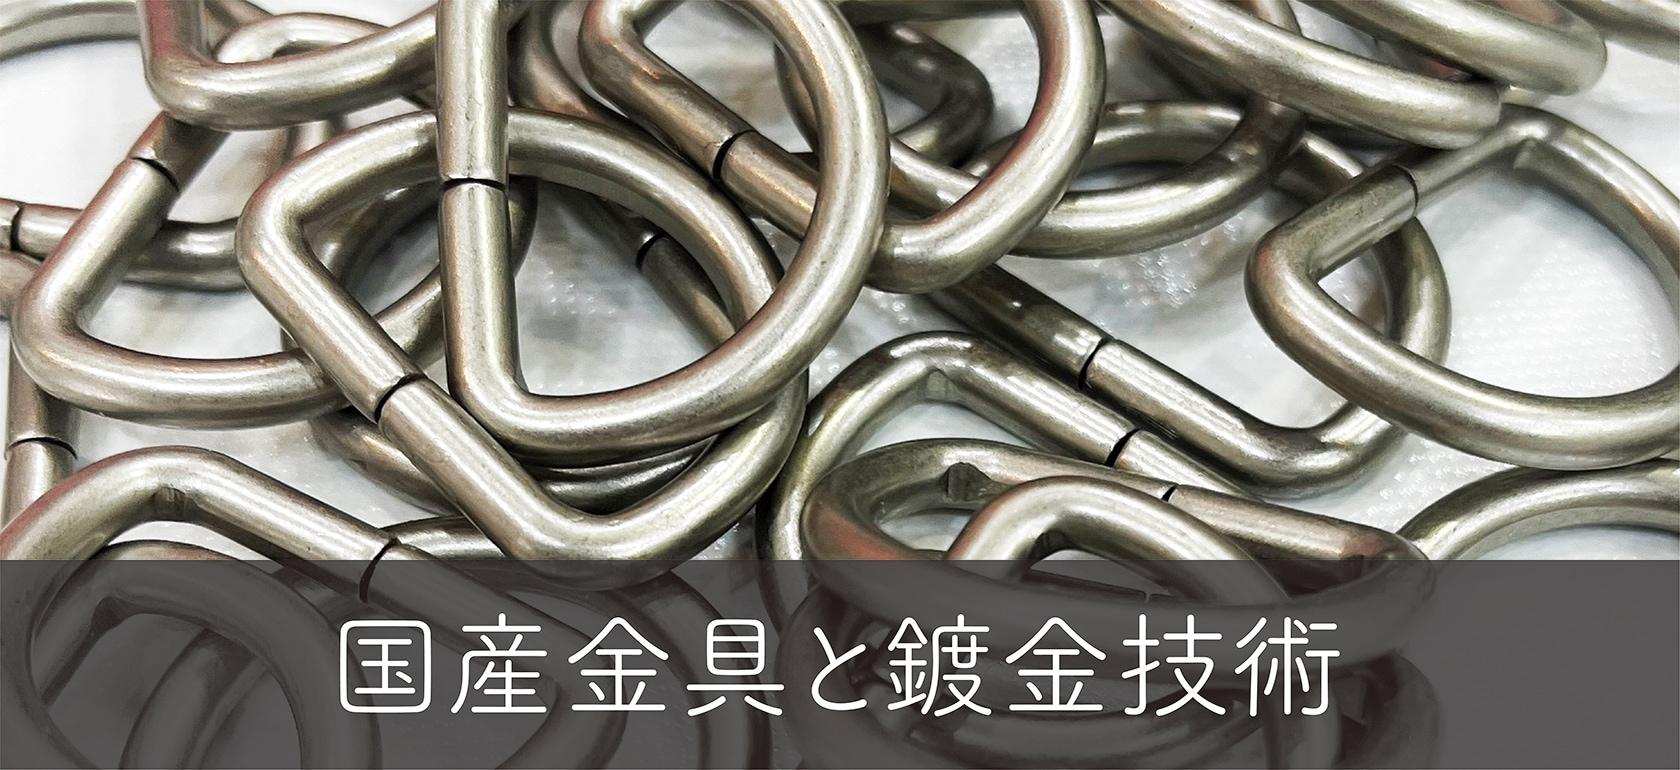 TENTとは 国産金具とメッキ技術